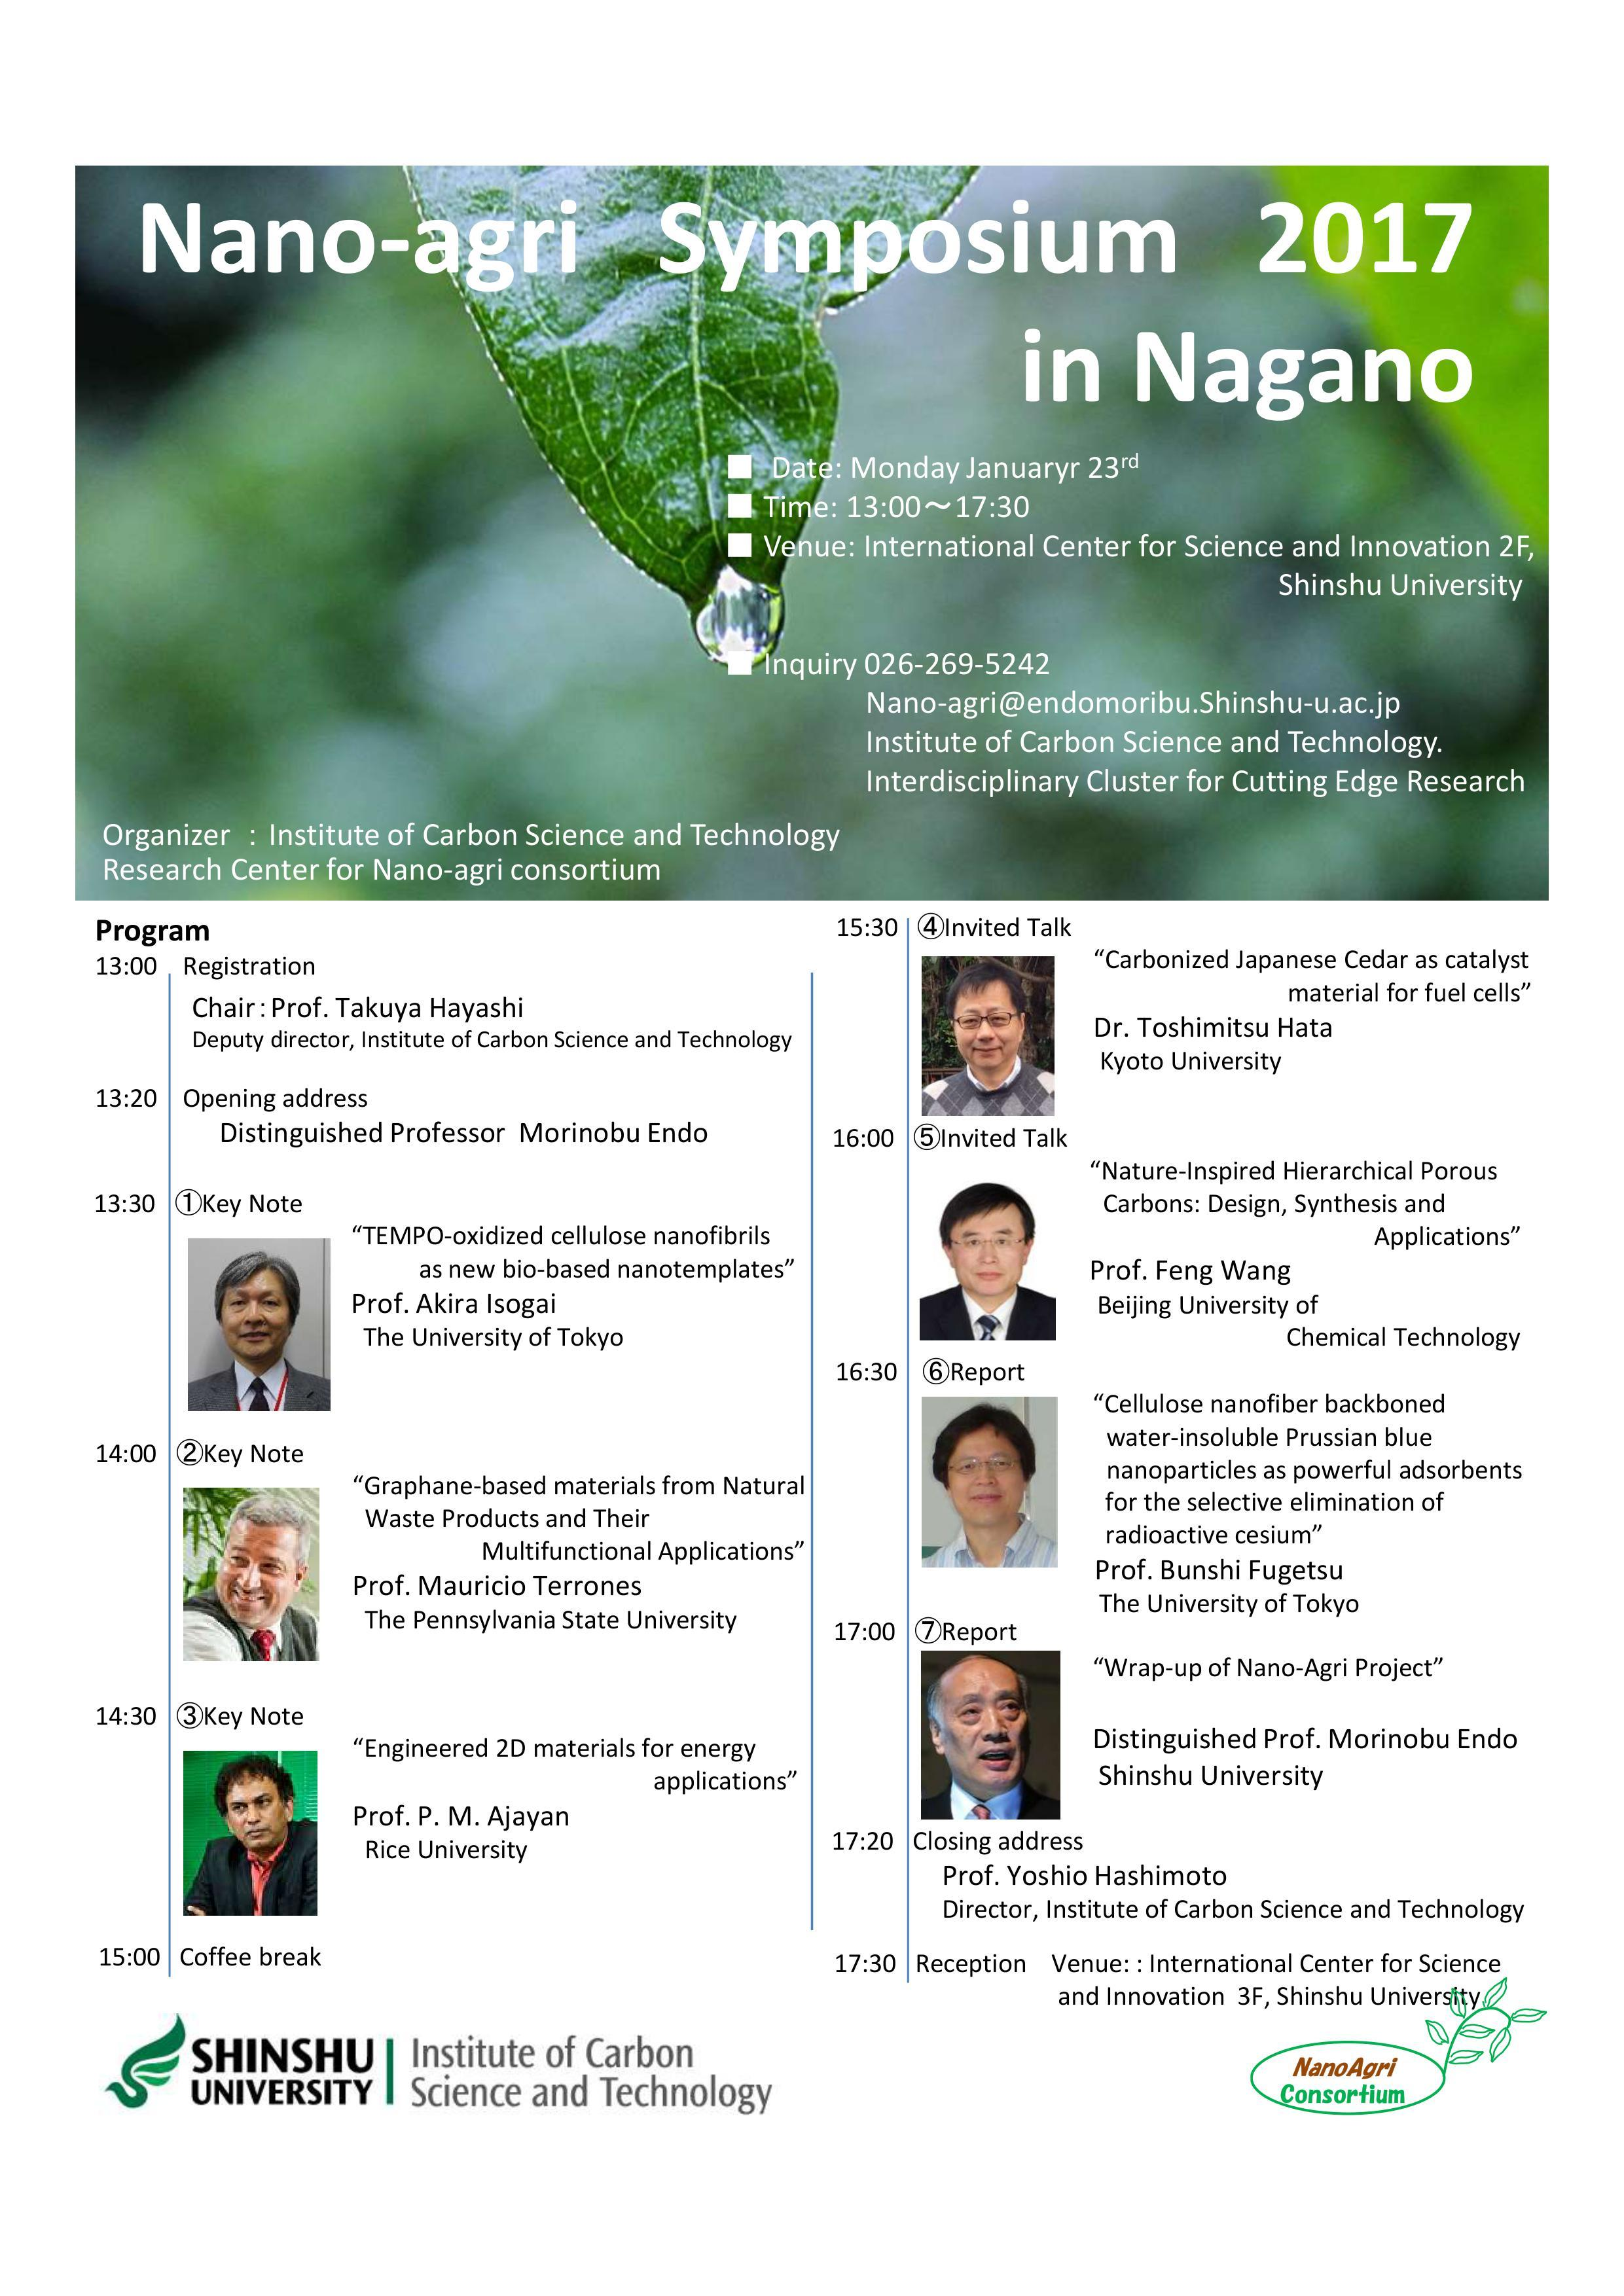 http://www.shinshu-u.ac.jp/institution/icst/topics/0001_2.jpg